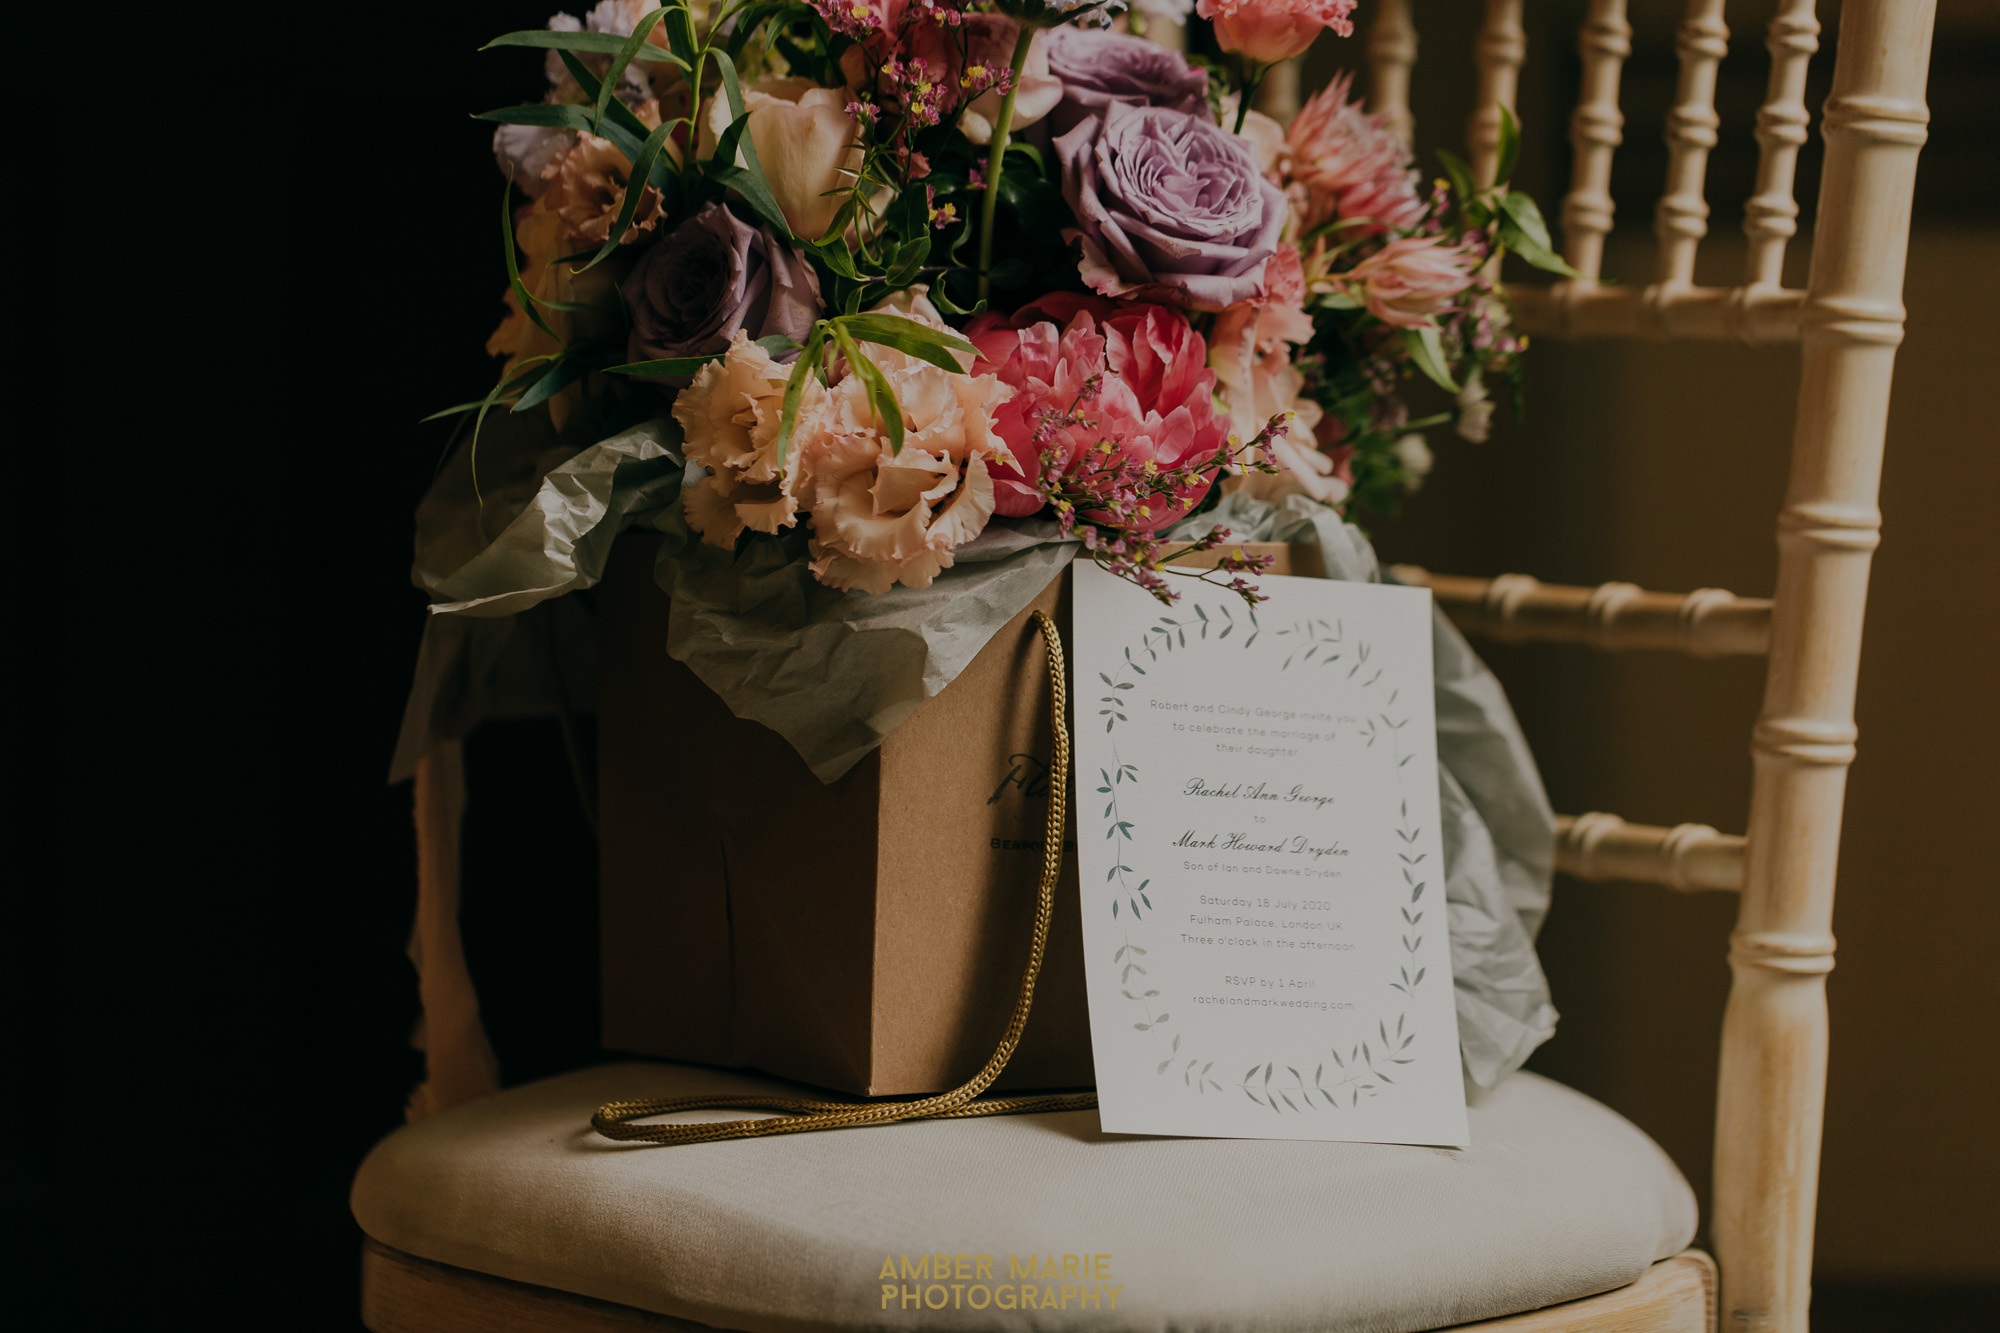 Creative photo of wedding invite and bride's bouquet